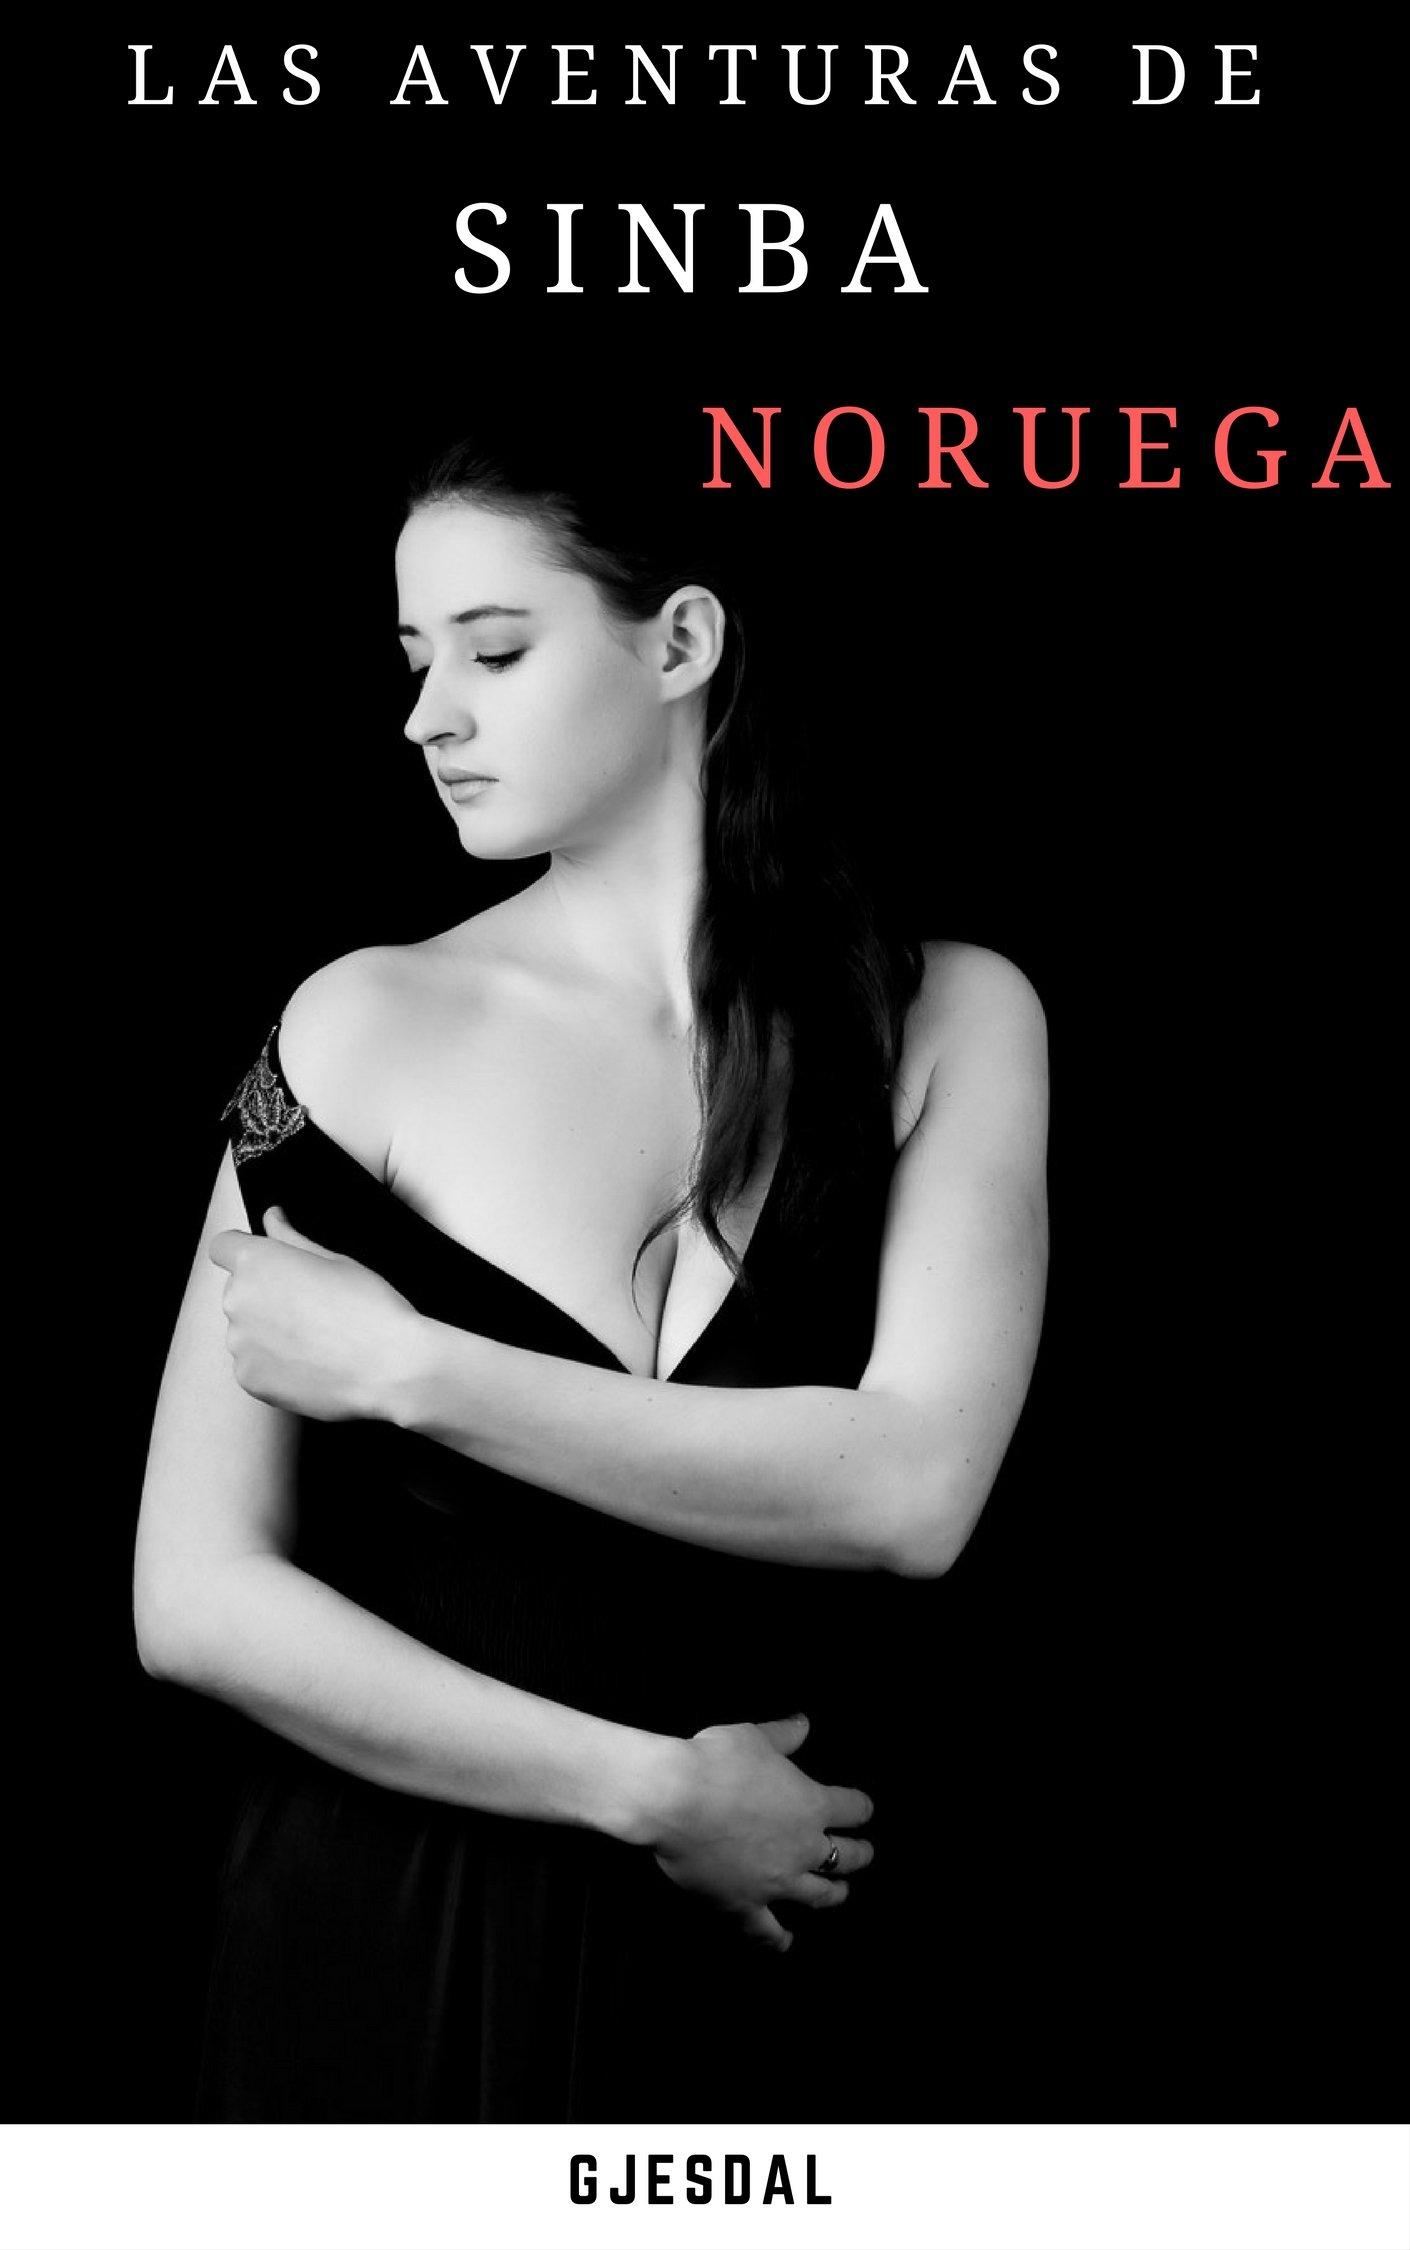 Las Aventuras De Sinba  Noruega  Spanish Edition